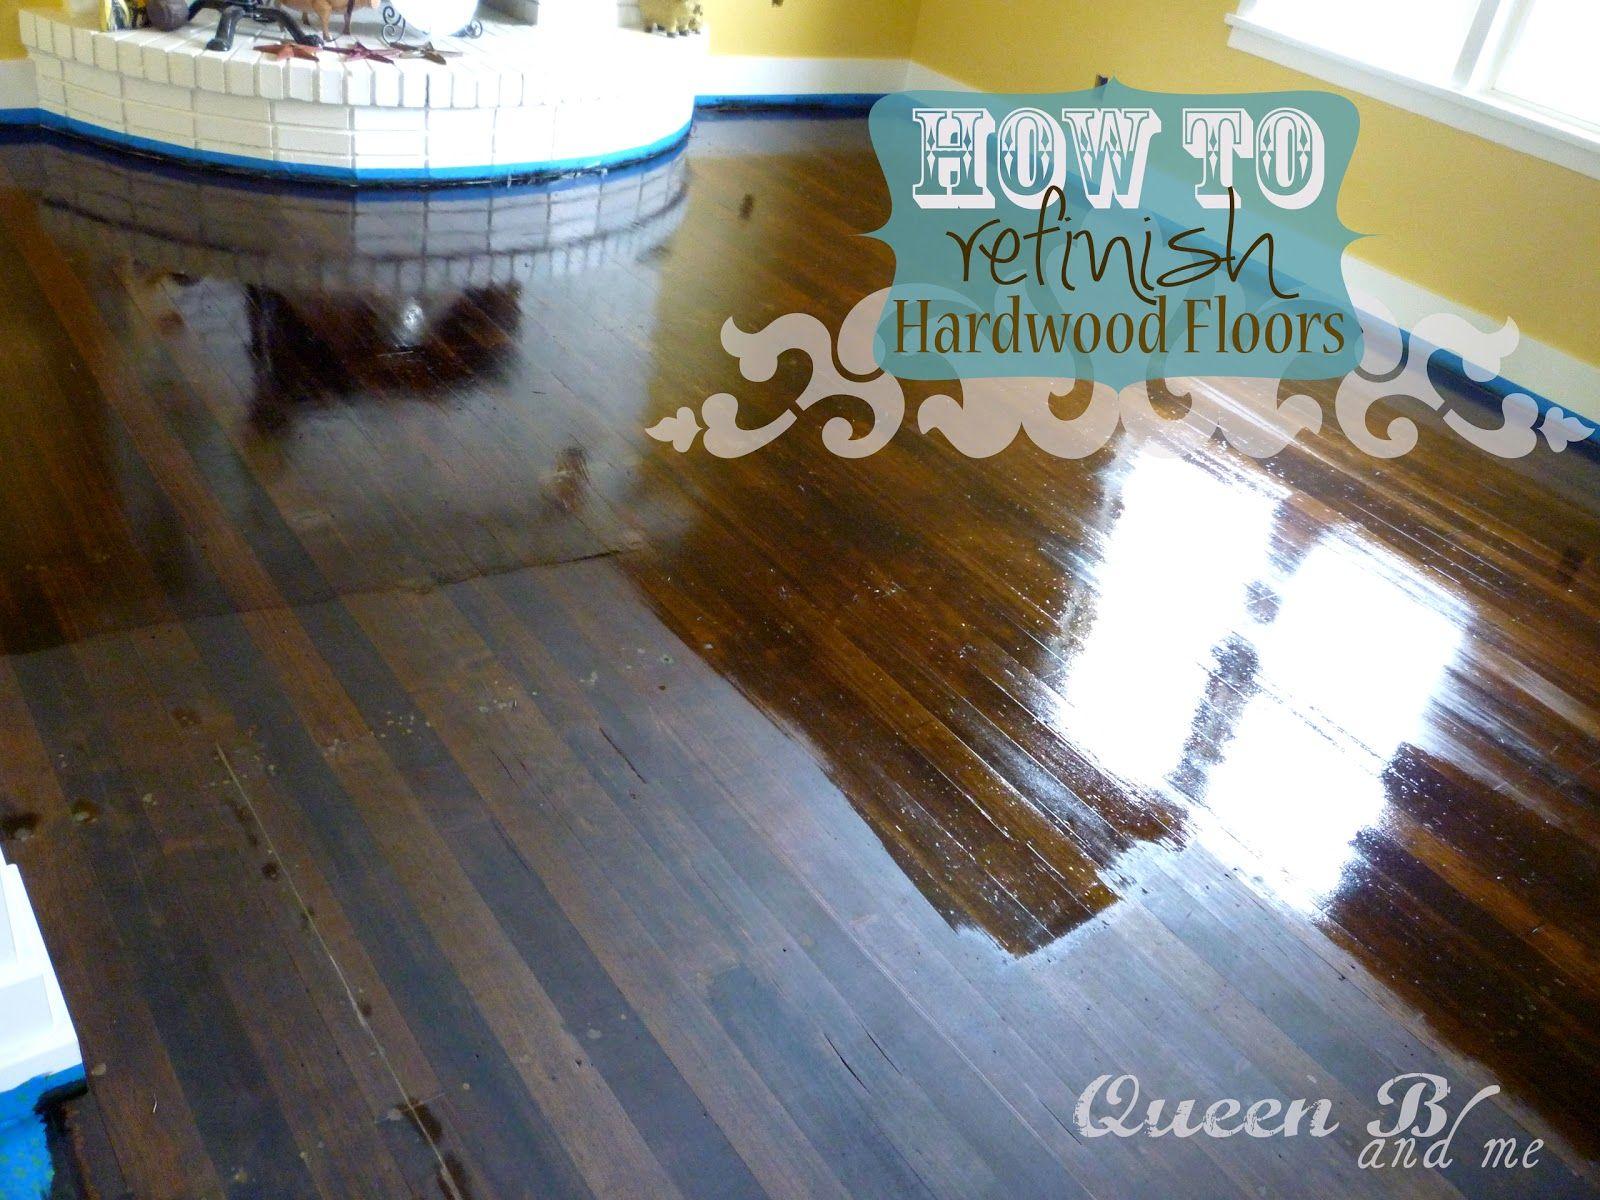 How to refinish hardwood floors lil luna diy decor pinterest how to refinish hardwood floors lil luna solutioingenieria Images